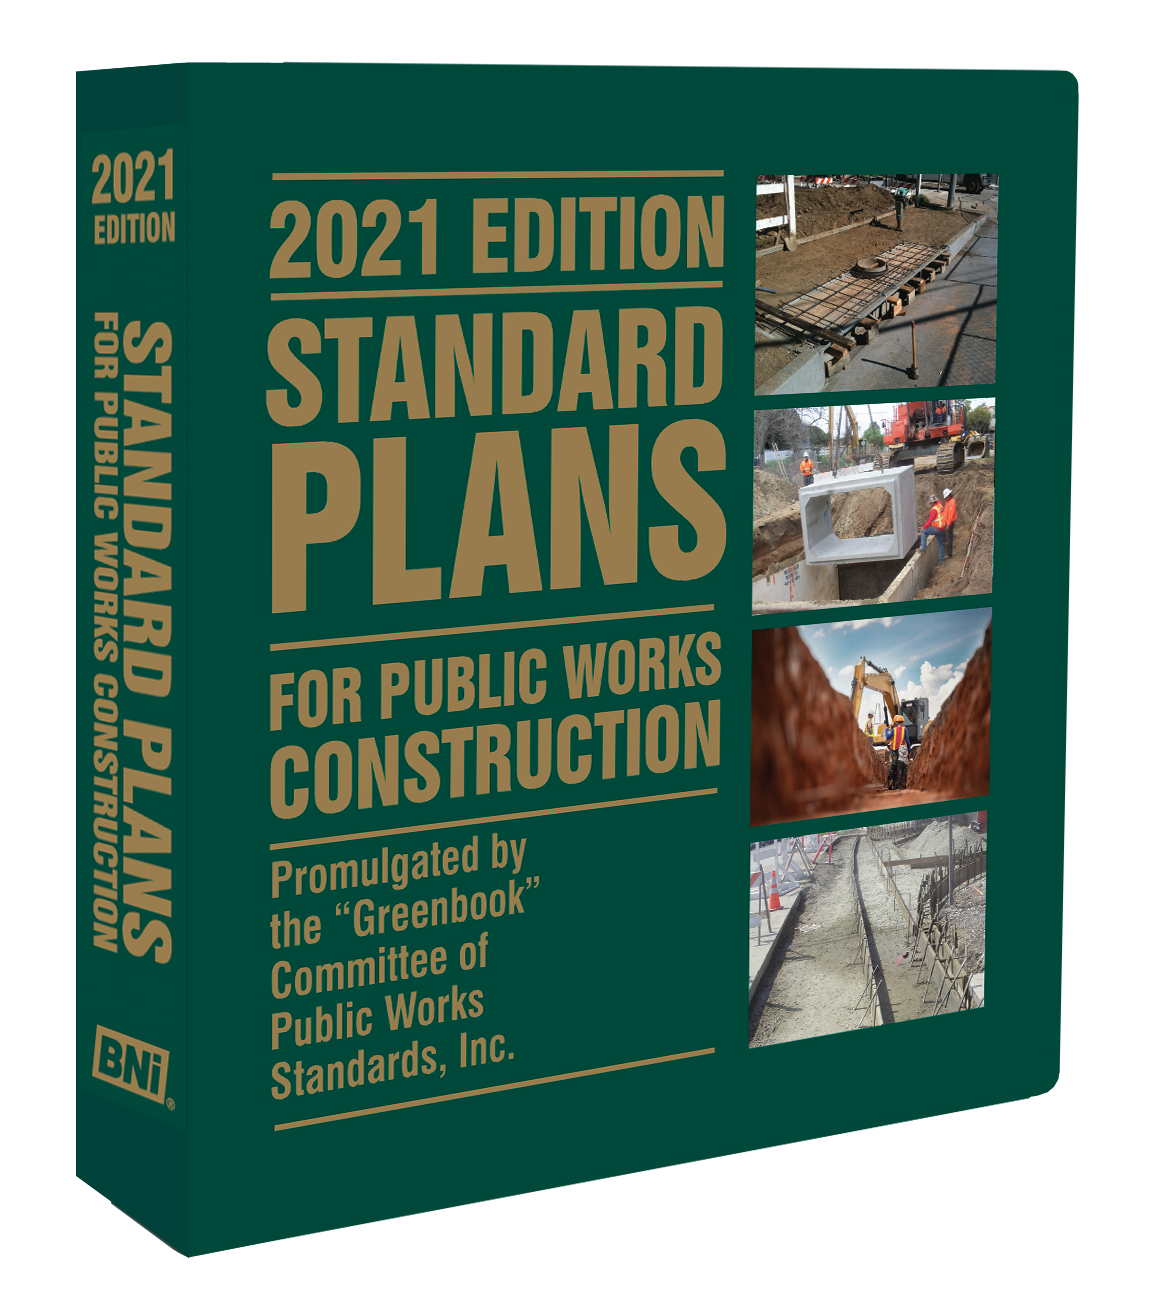 Standard Plans for Public Works Construction, 2021 Edition